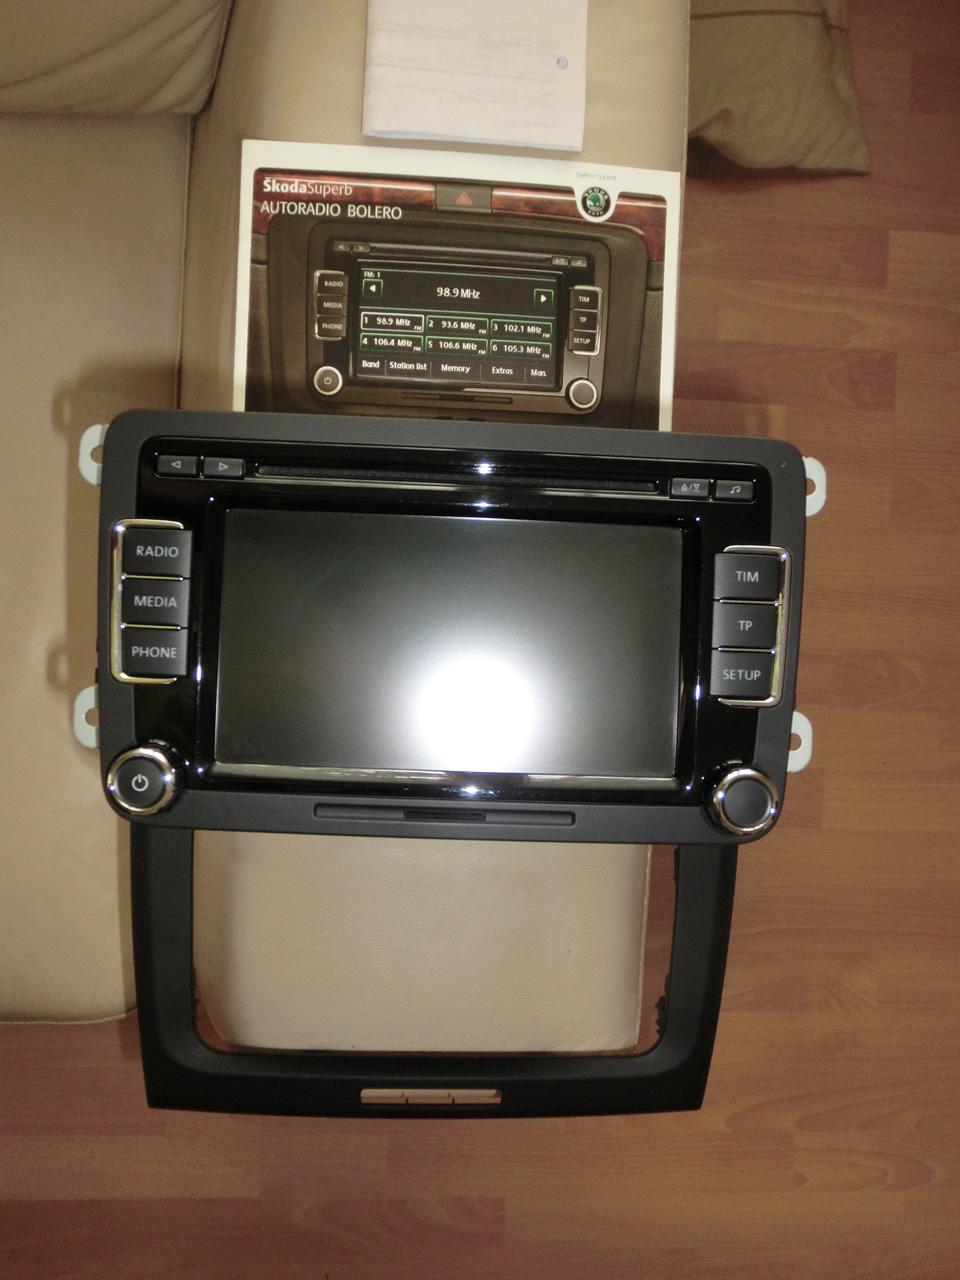 radio bolero de un skoda superb ii como vw rcd 510 ebay. Black Bedroom Furniture Sets. Home Design Ideas